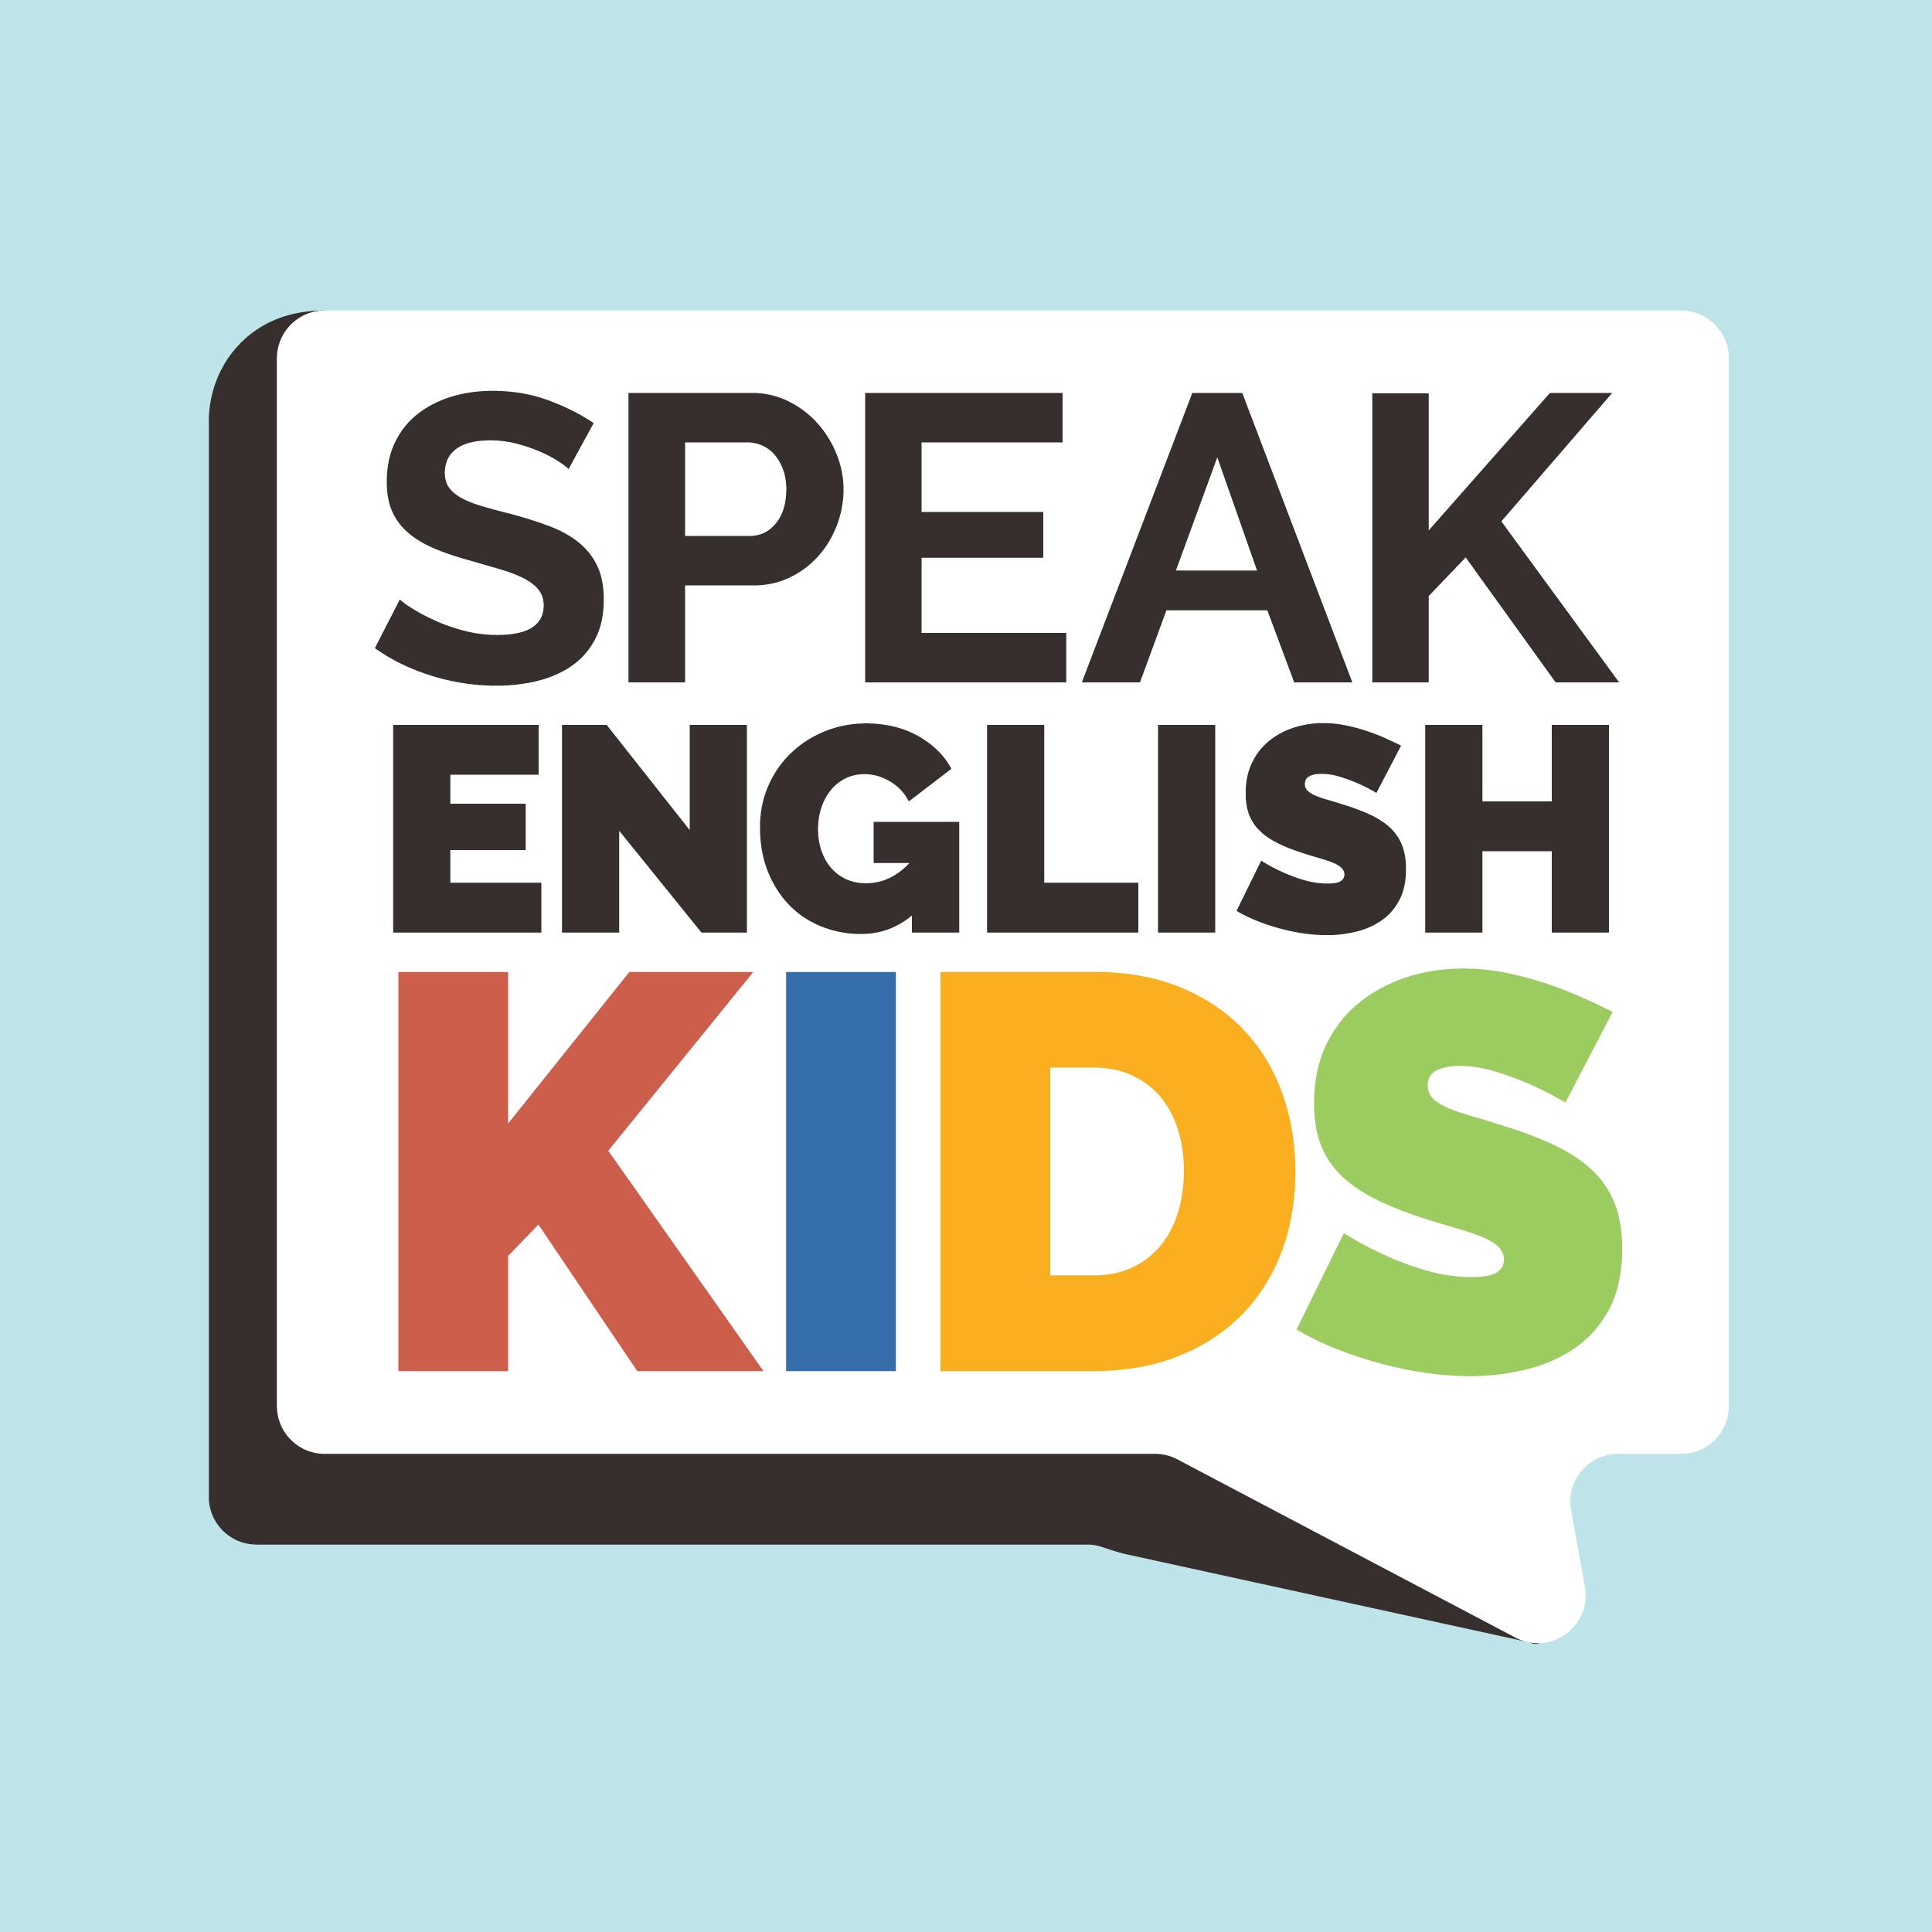 Speak English Kids Design Sarah Dean Design And